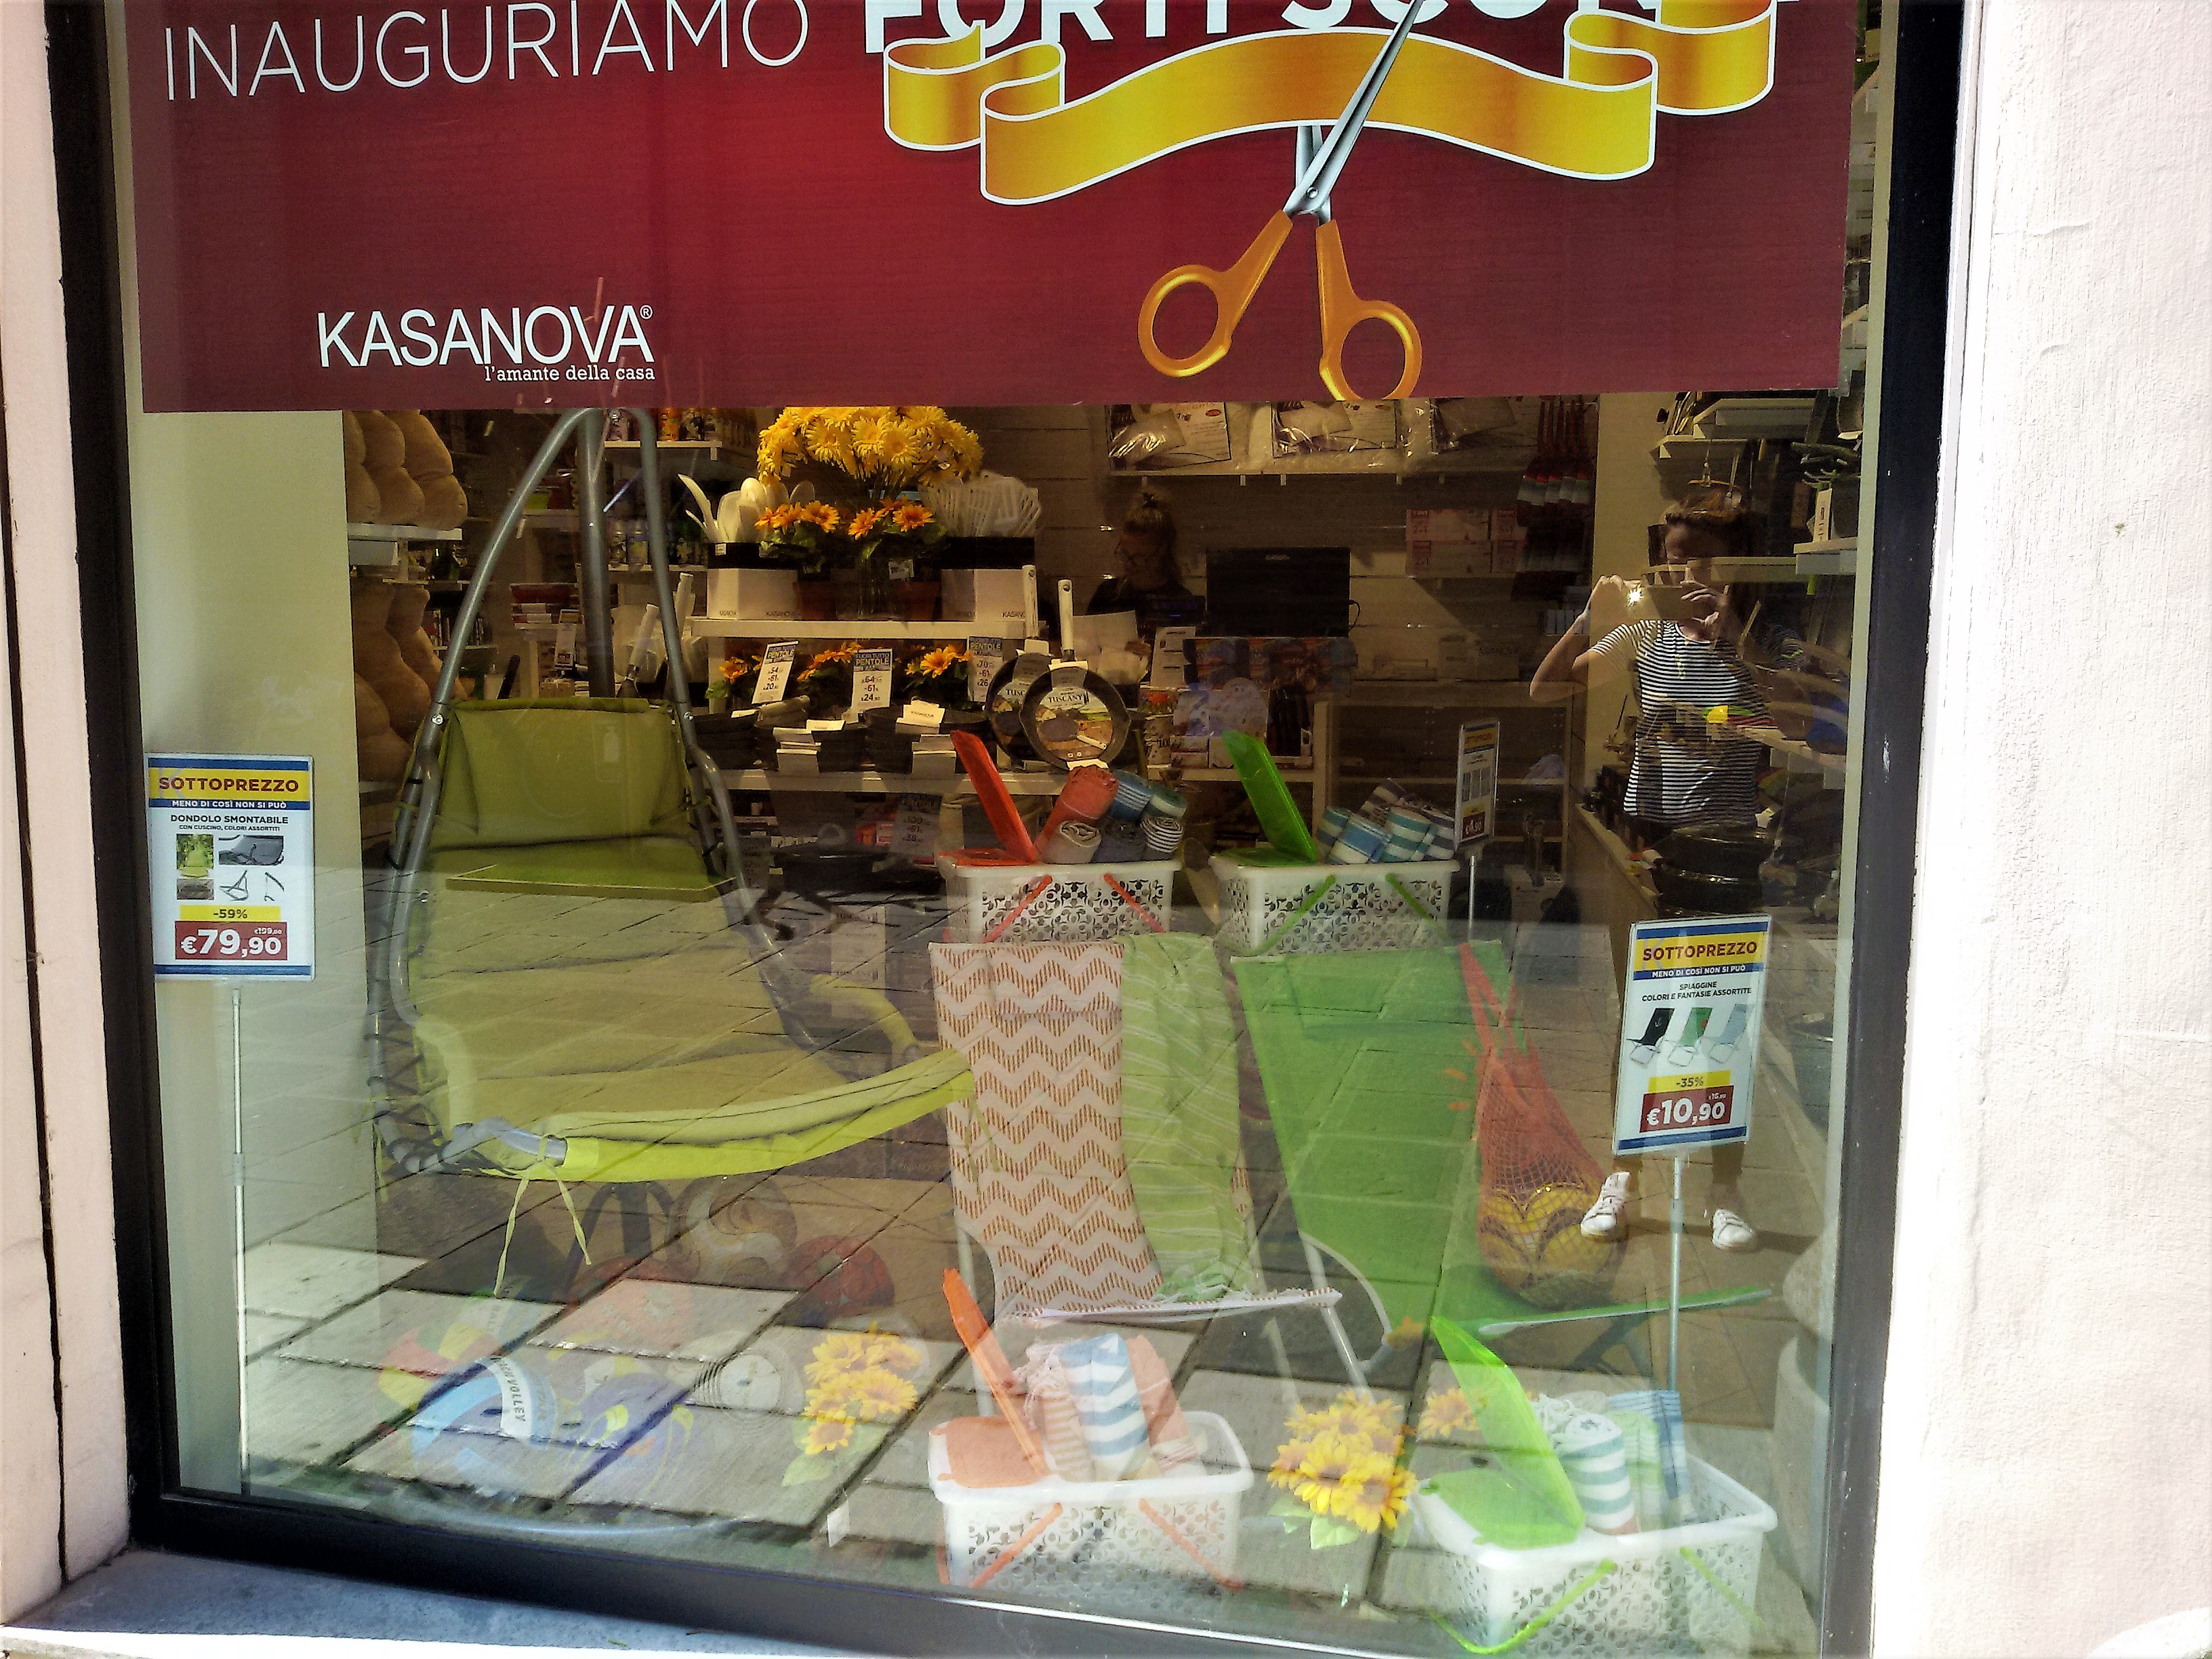 A cesena il nuovo punto vendita kasanova for Kasanova casa